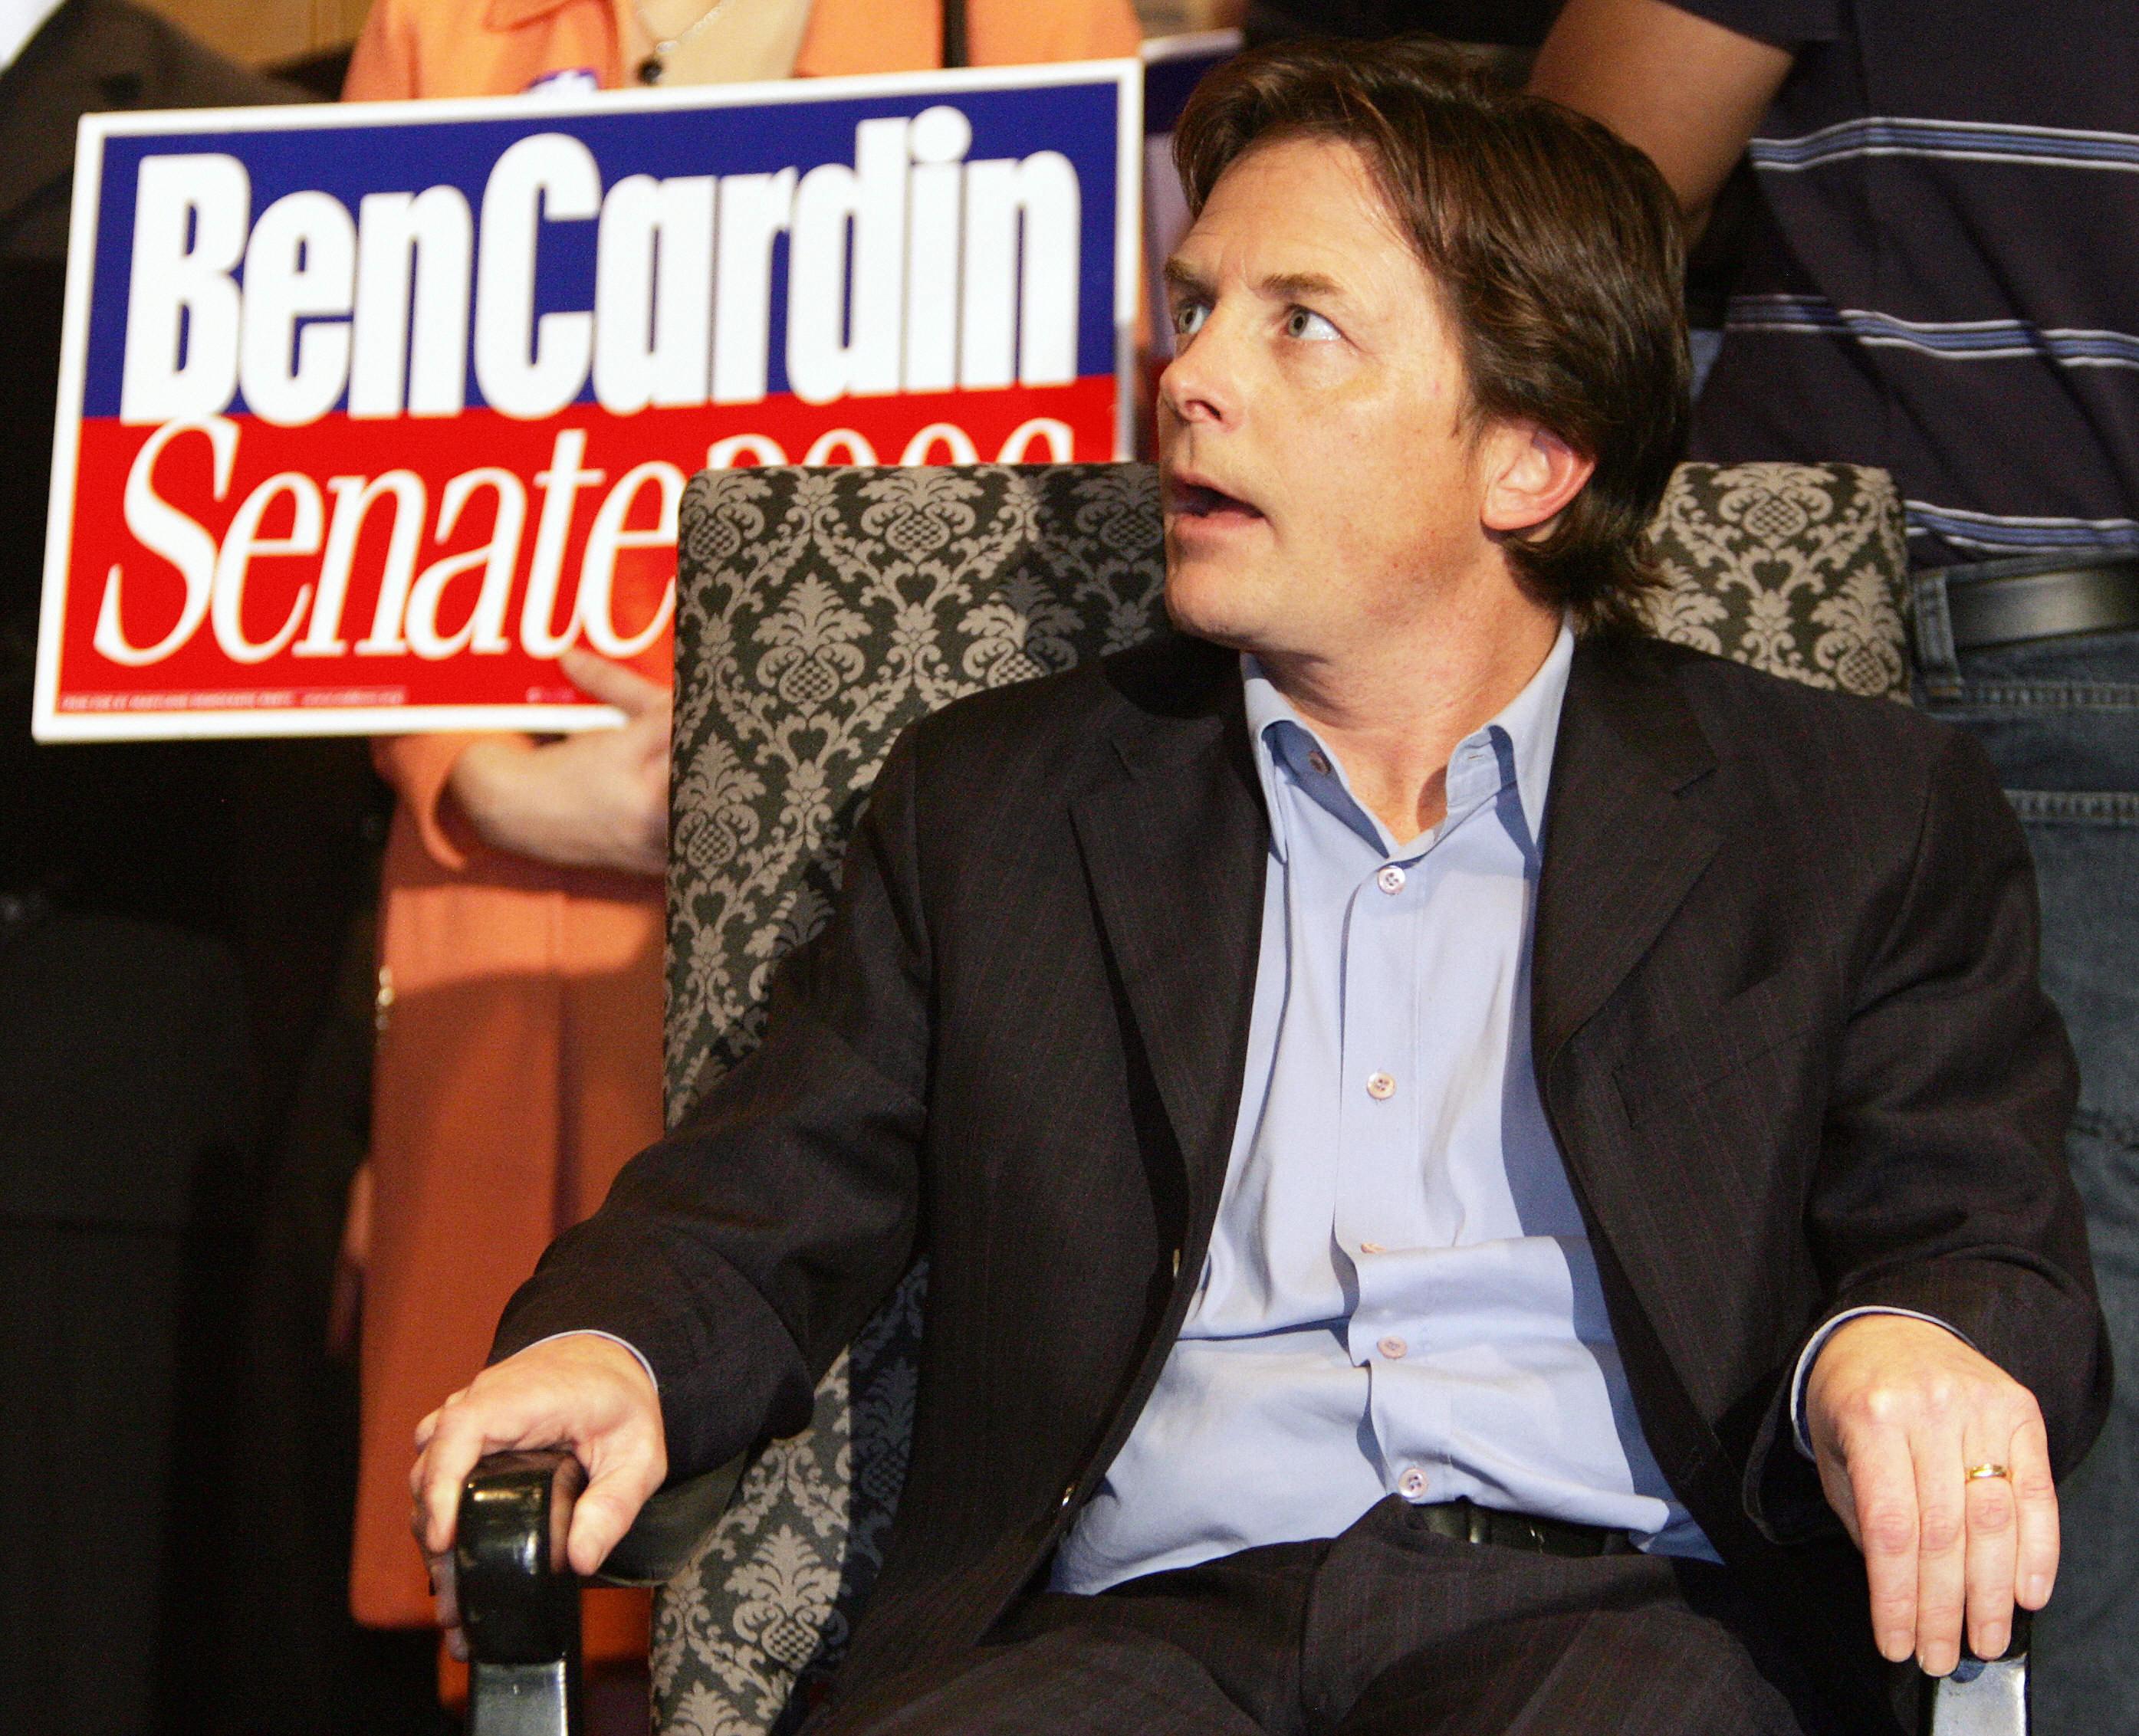 Actor Michael J. Fox